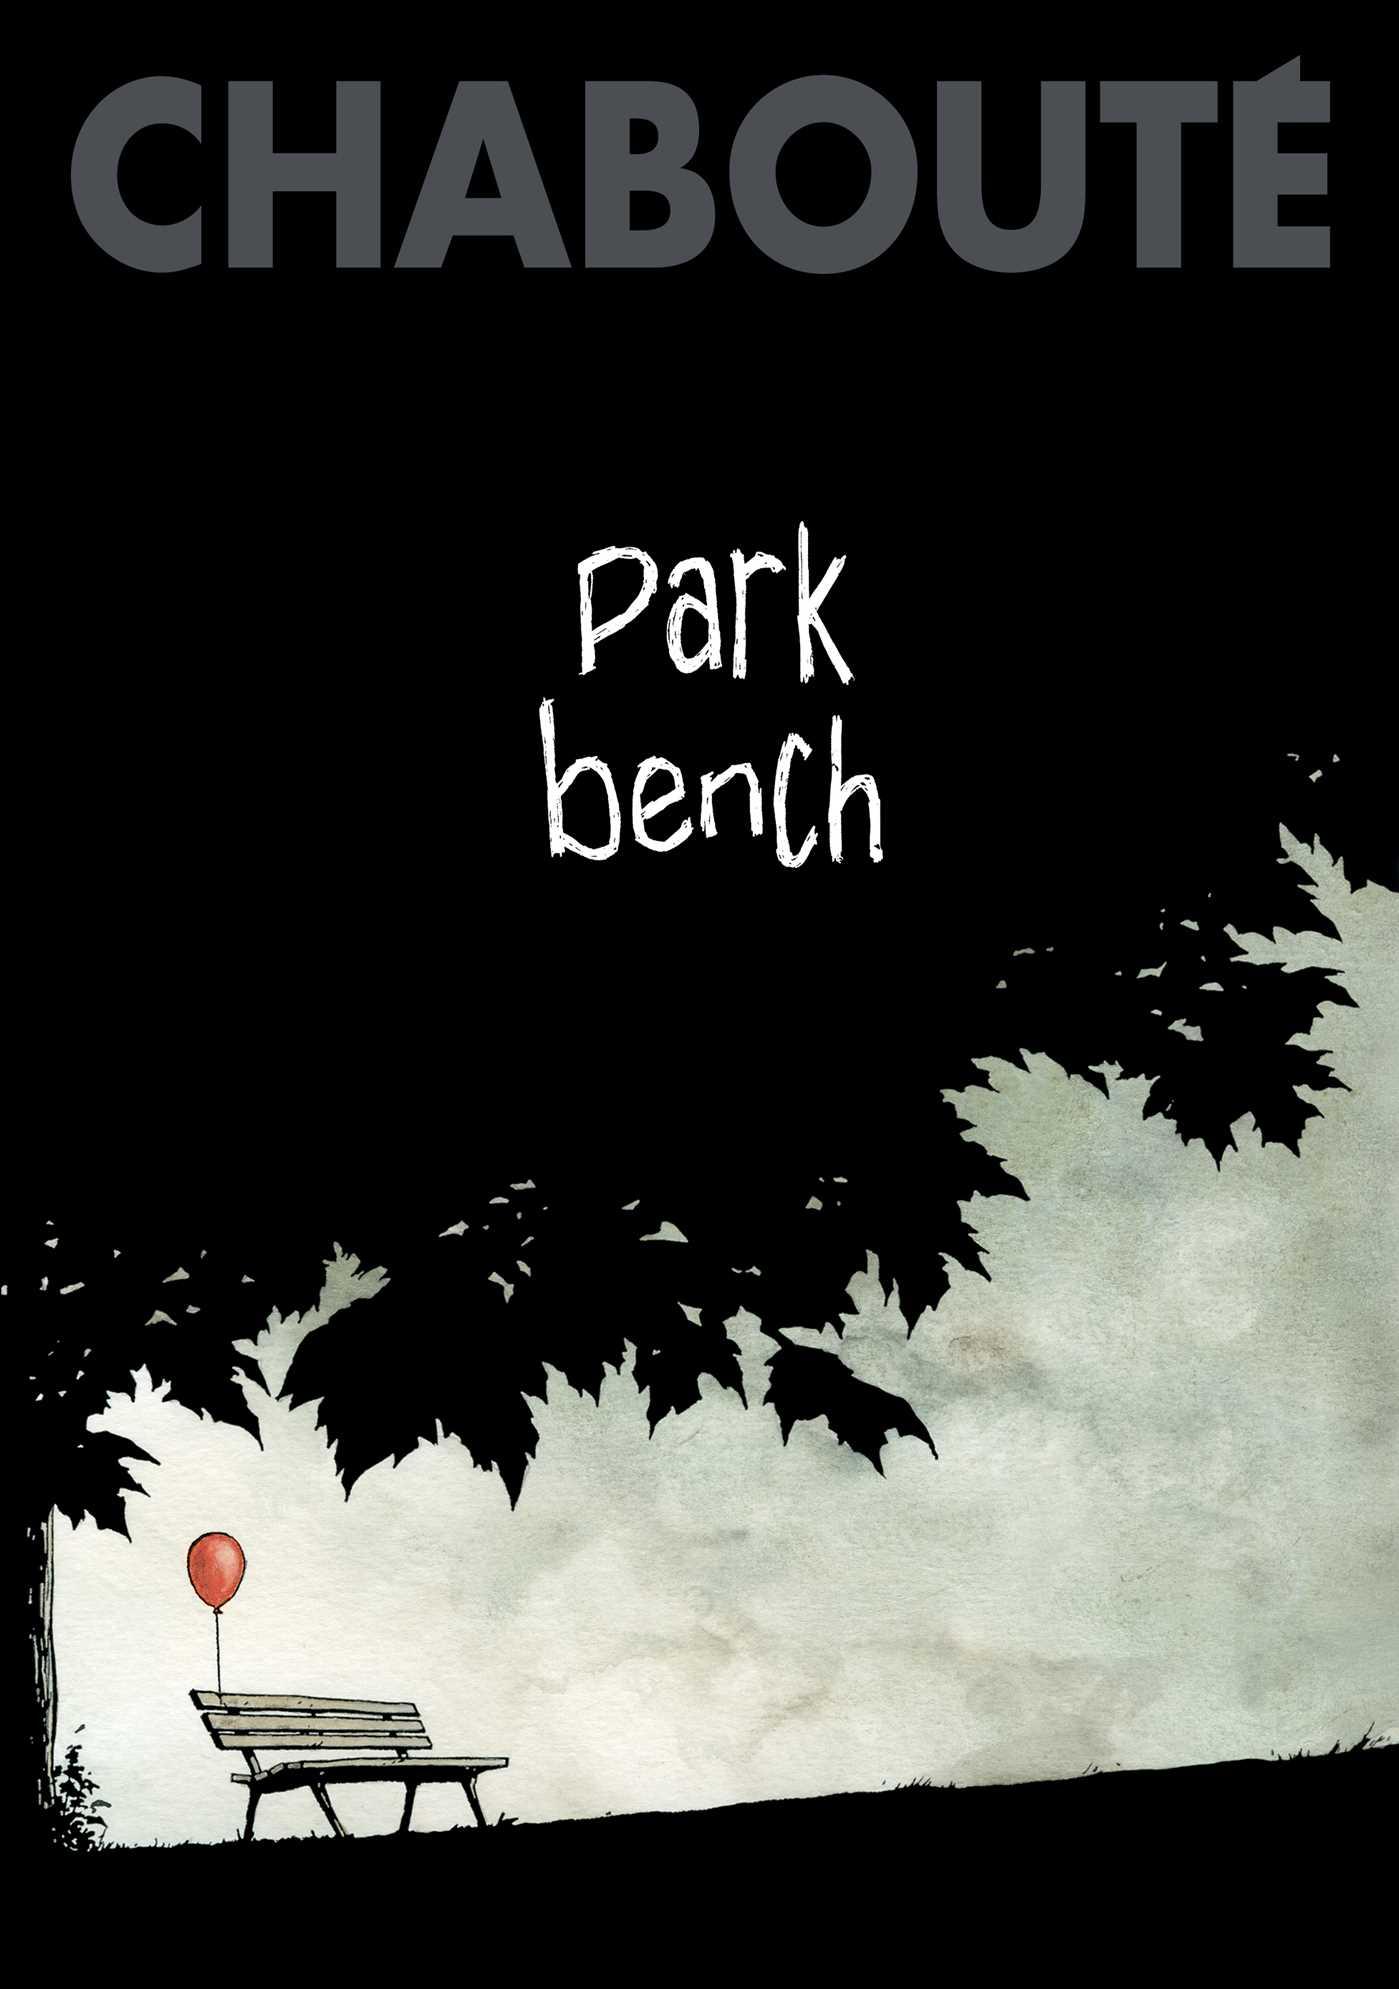 Park bench 9781501154027 hr